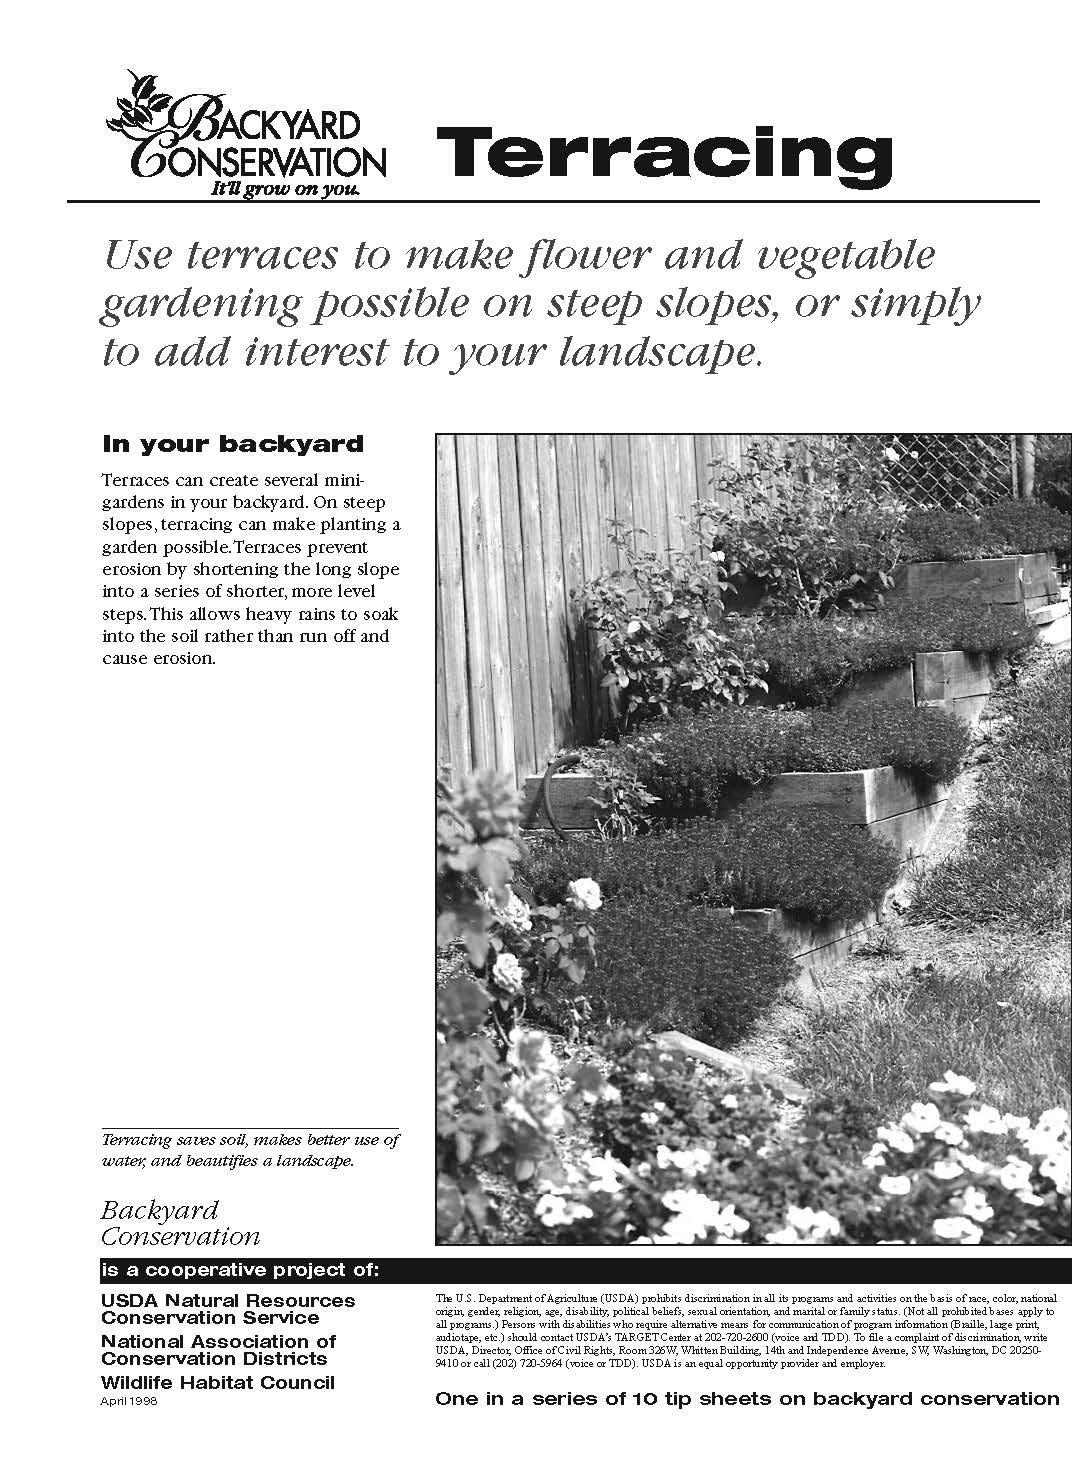 Backyard Conservation Terracing tip sheet